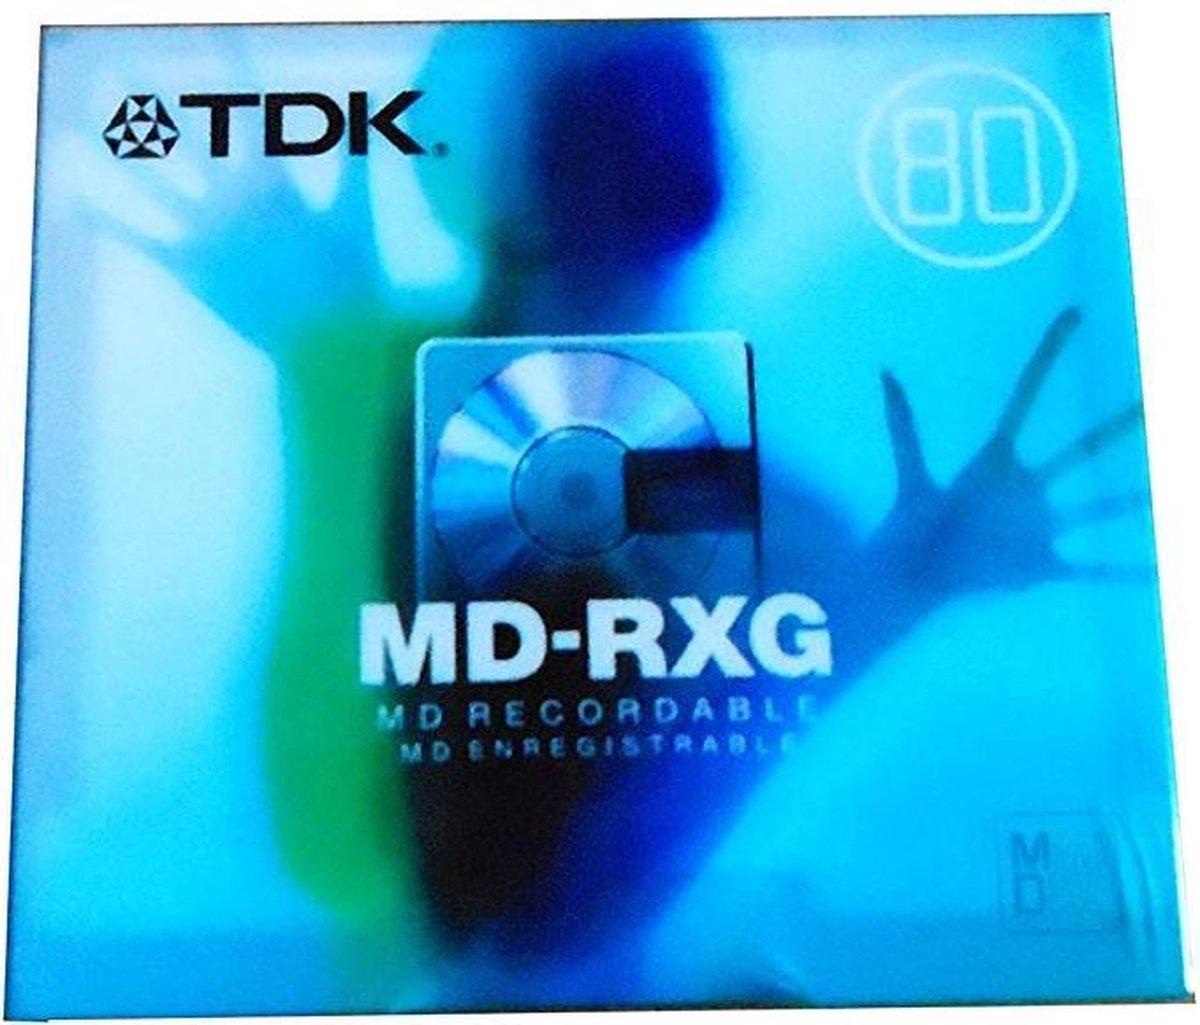 TDK MD-RXG MD recordable 80 minidisc